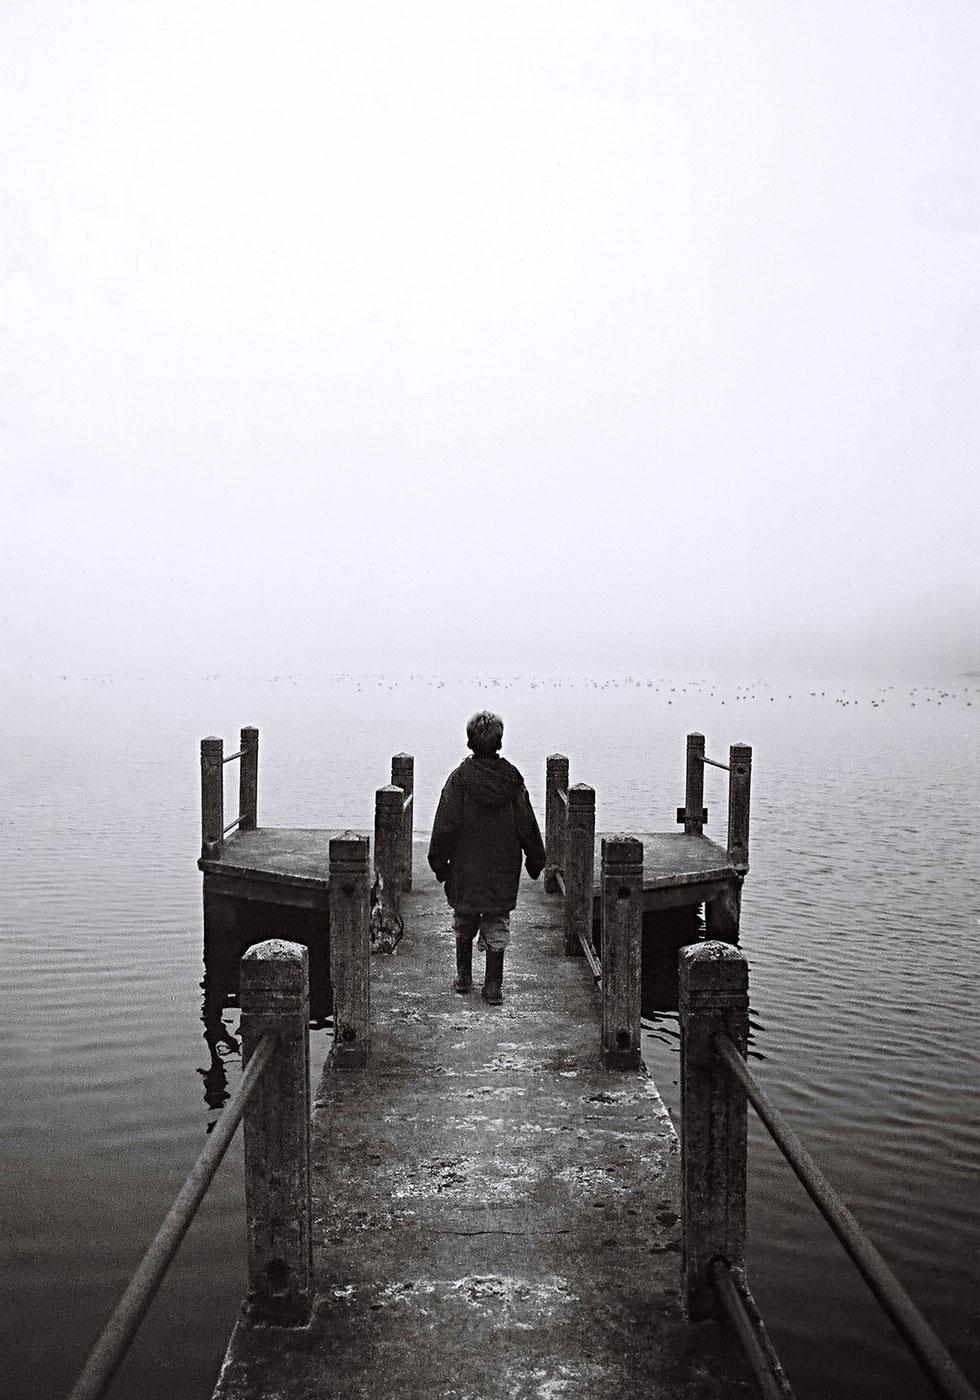 In the mist, Tijs 1996